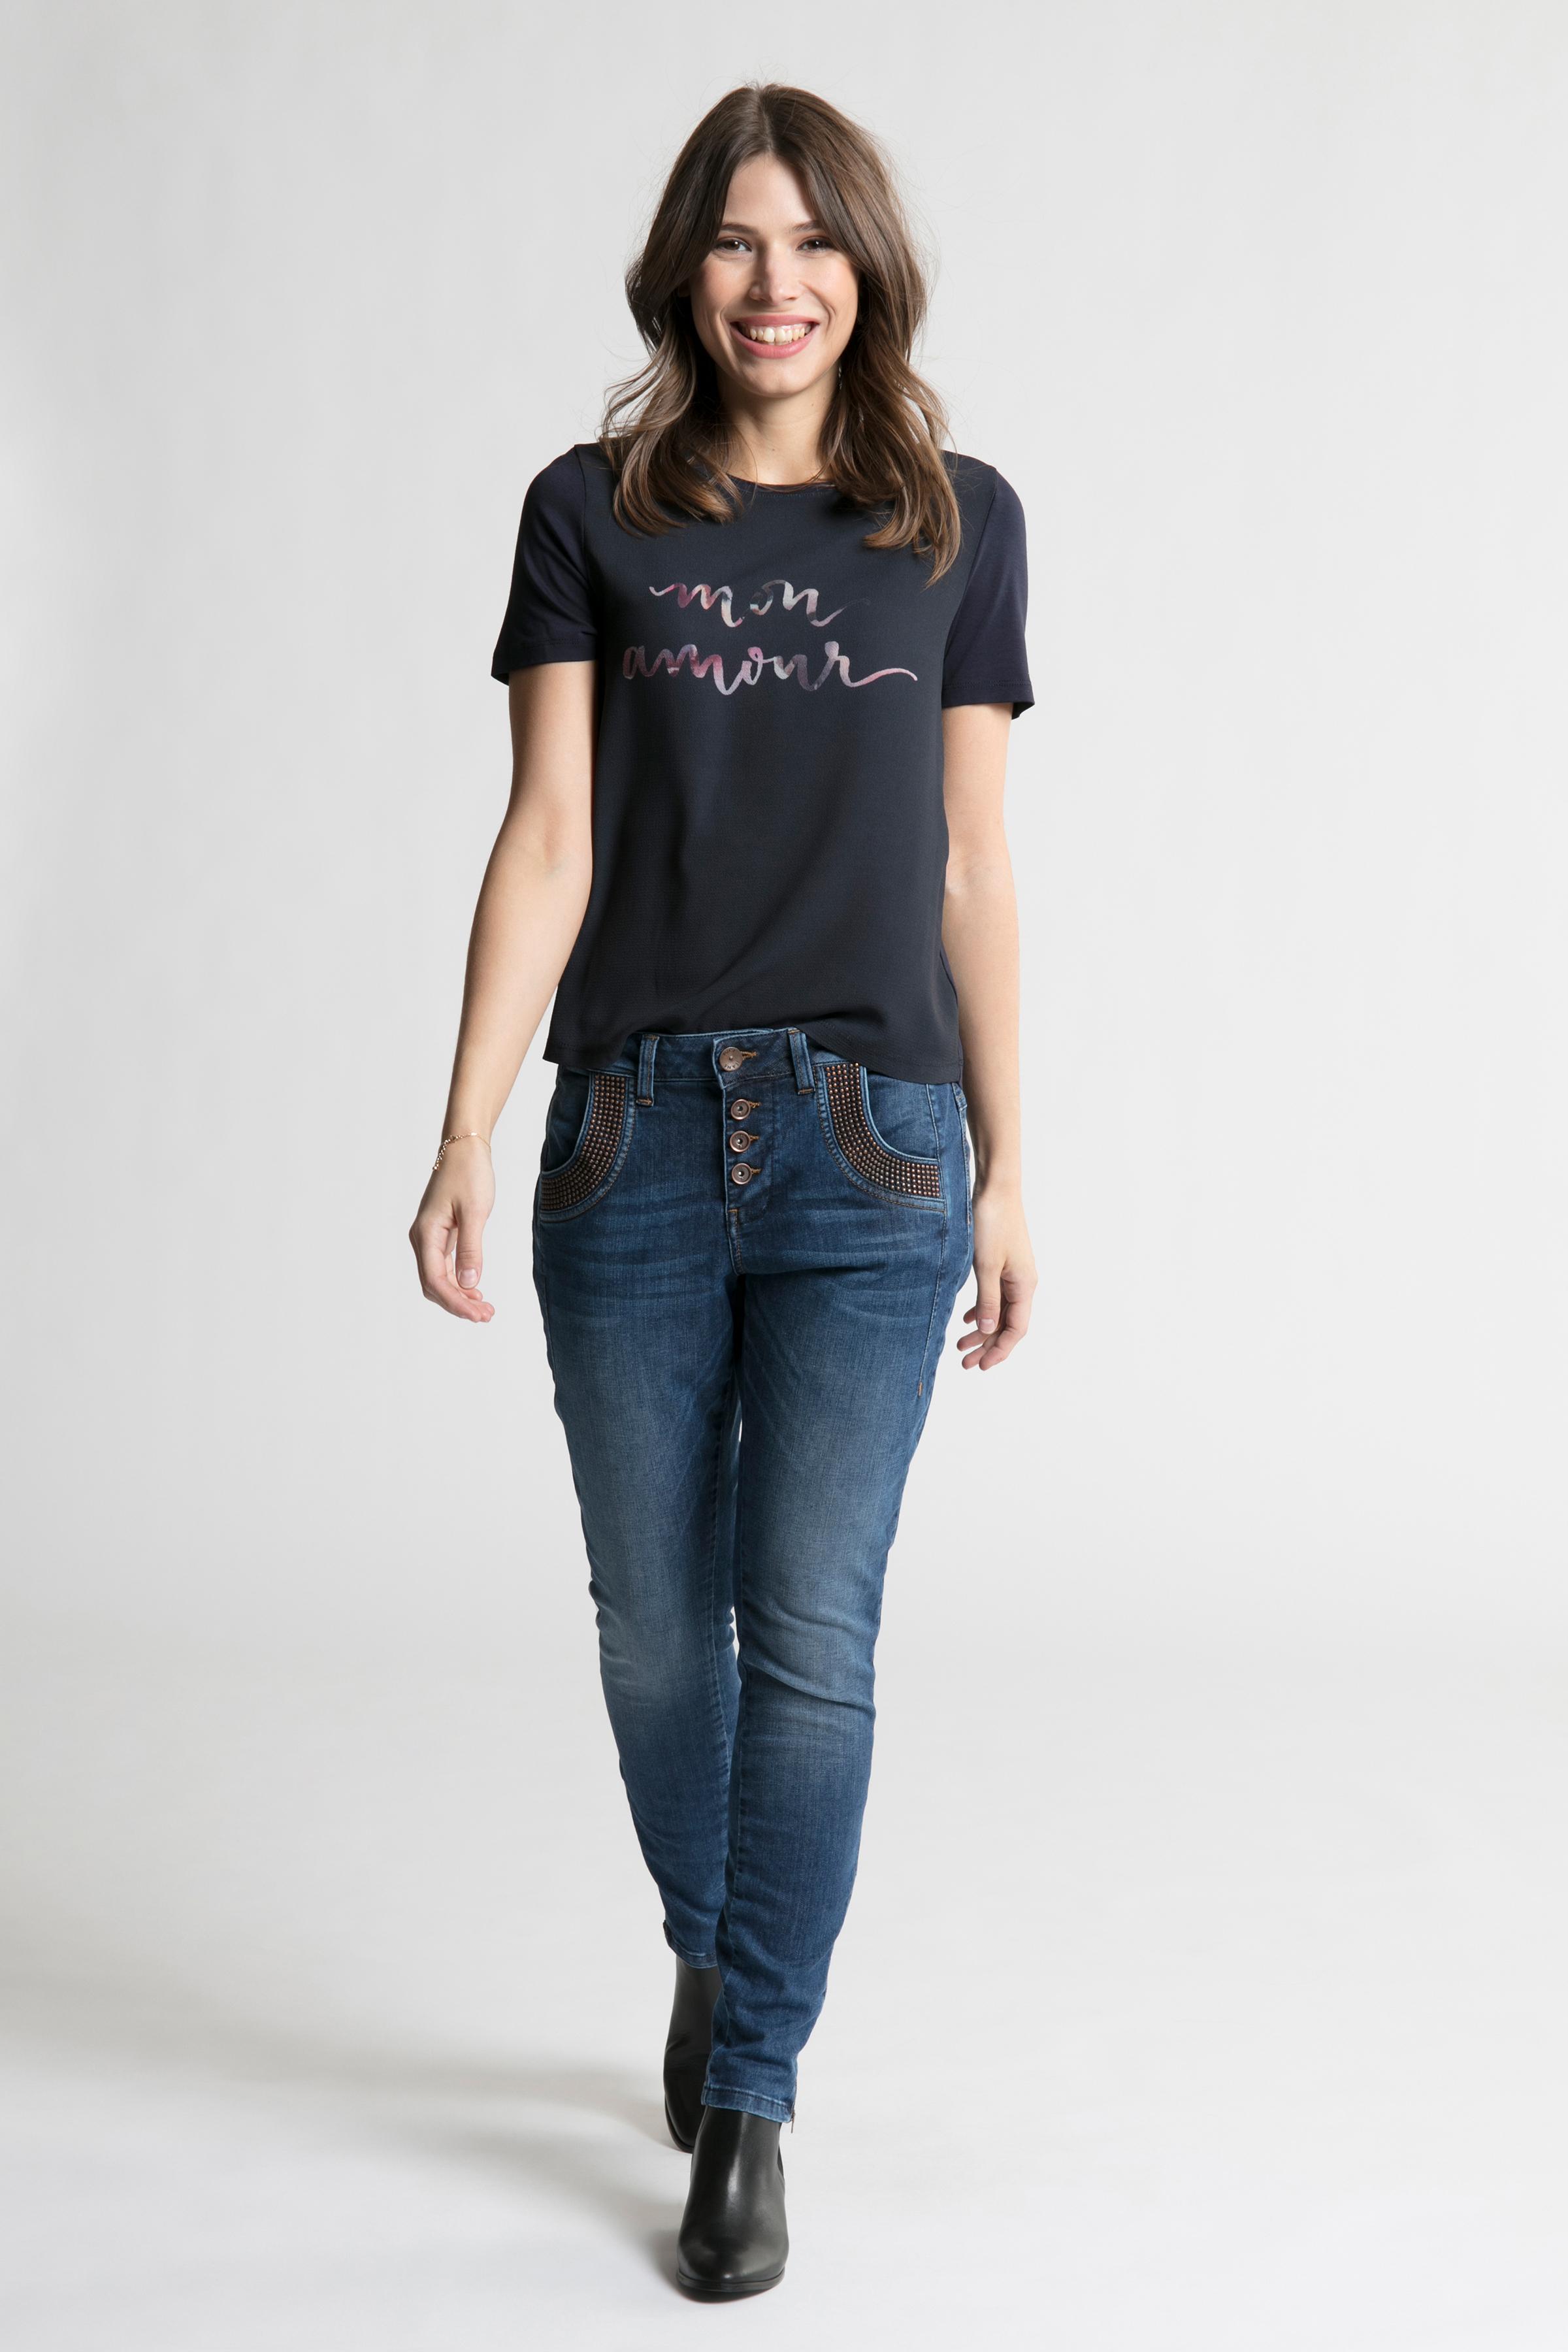 Marineblå Kortærmet T-shirt  fra Bon'A Parte – Køb Marineblå Kortærmet T-shirt  fra str. S-2XL her